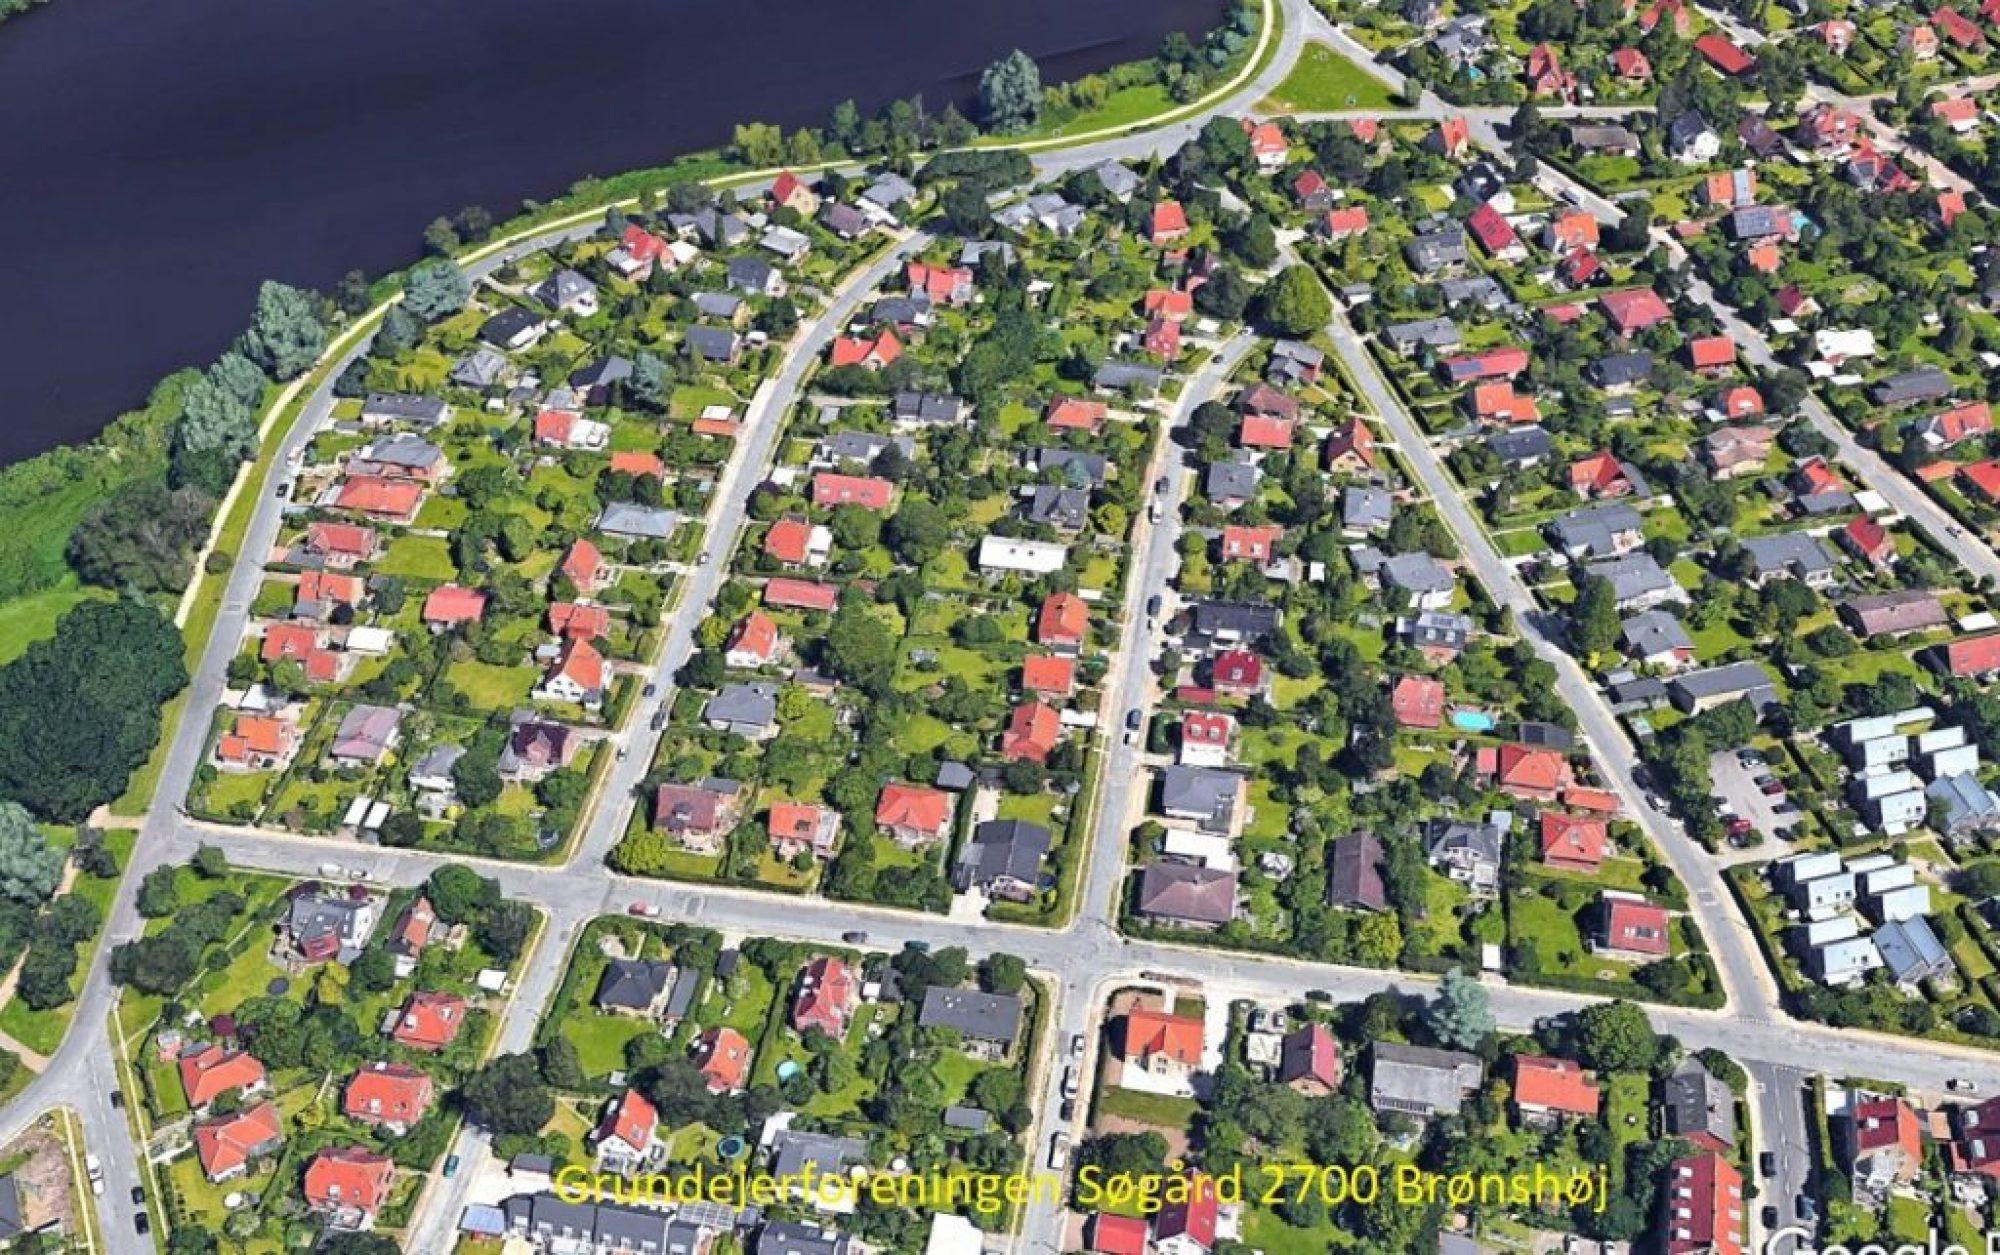 Grundejerforeningen Søgård. Generalforsamling 14/6 2020 i postkassen. Se underpunkt.